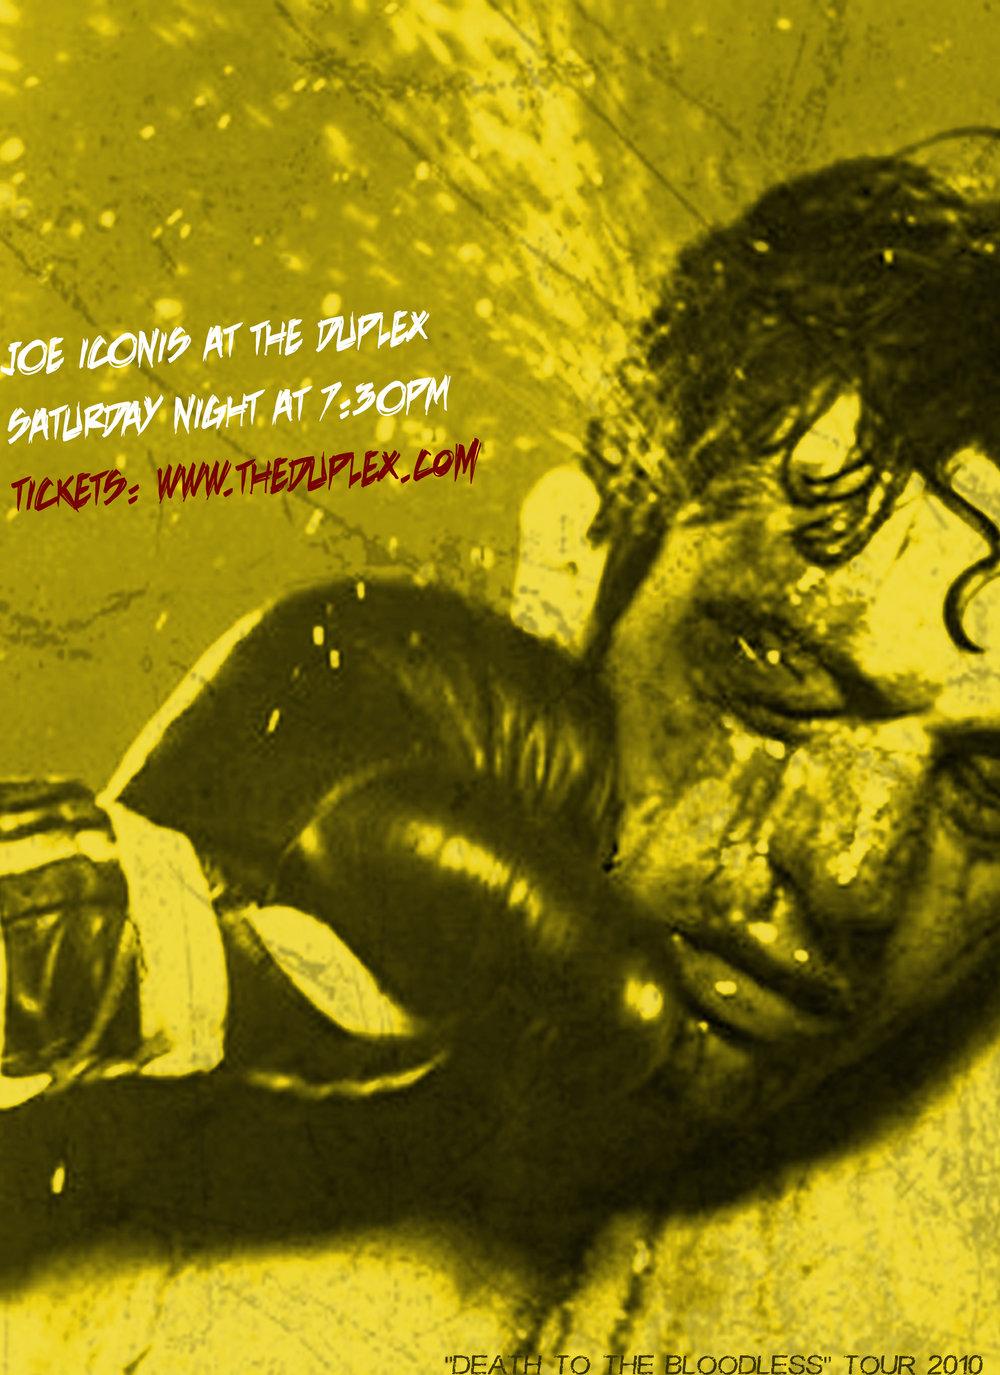 Iconis-Duplex-Poster.jpg